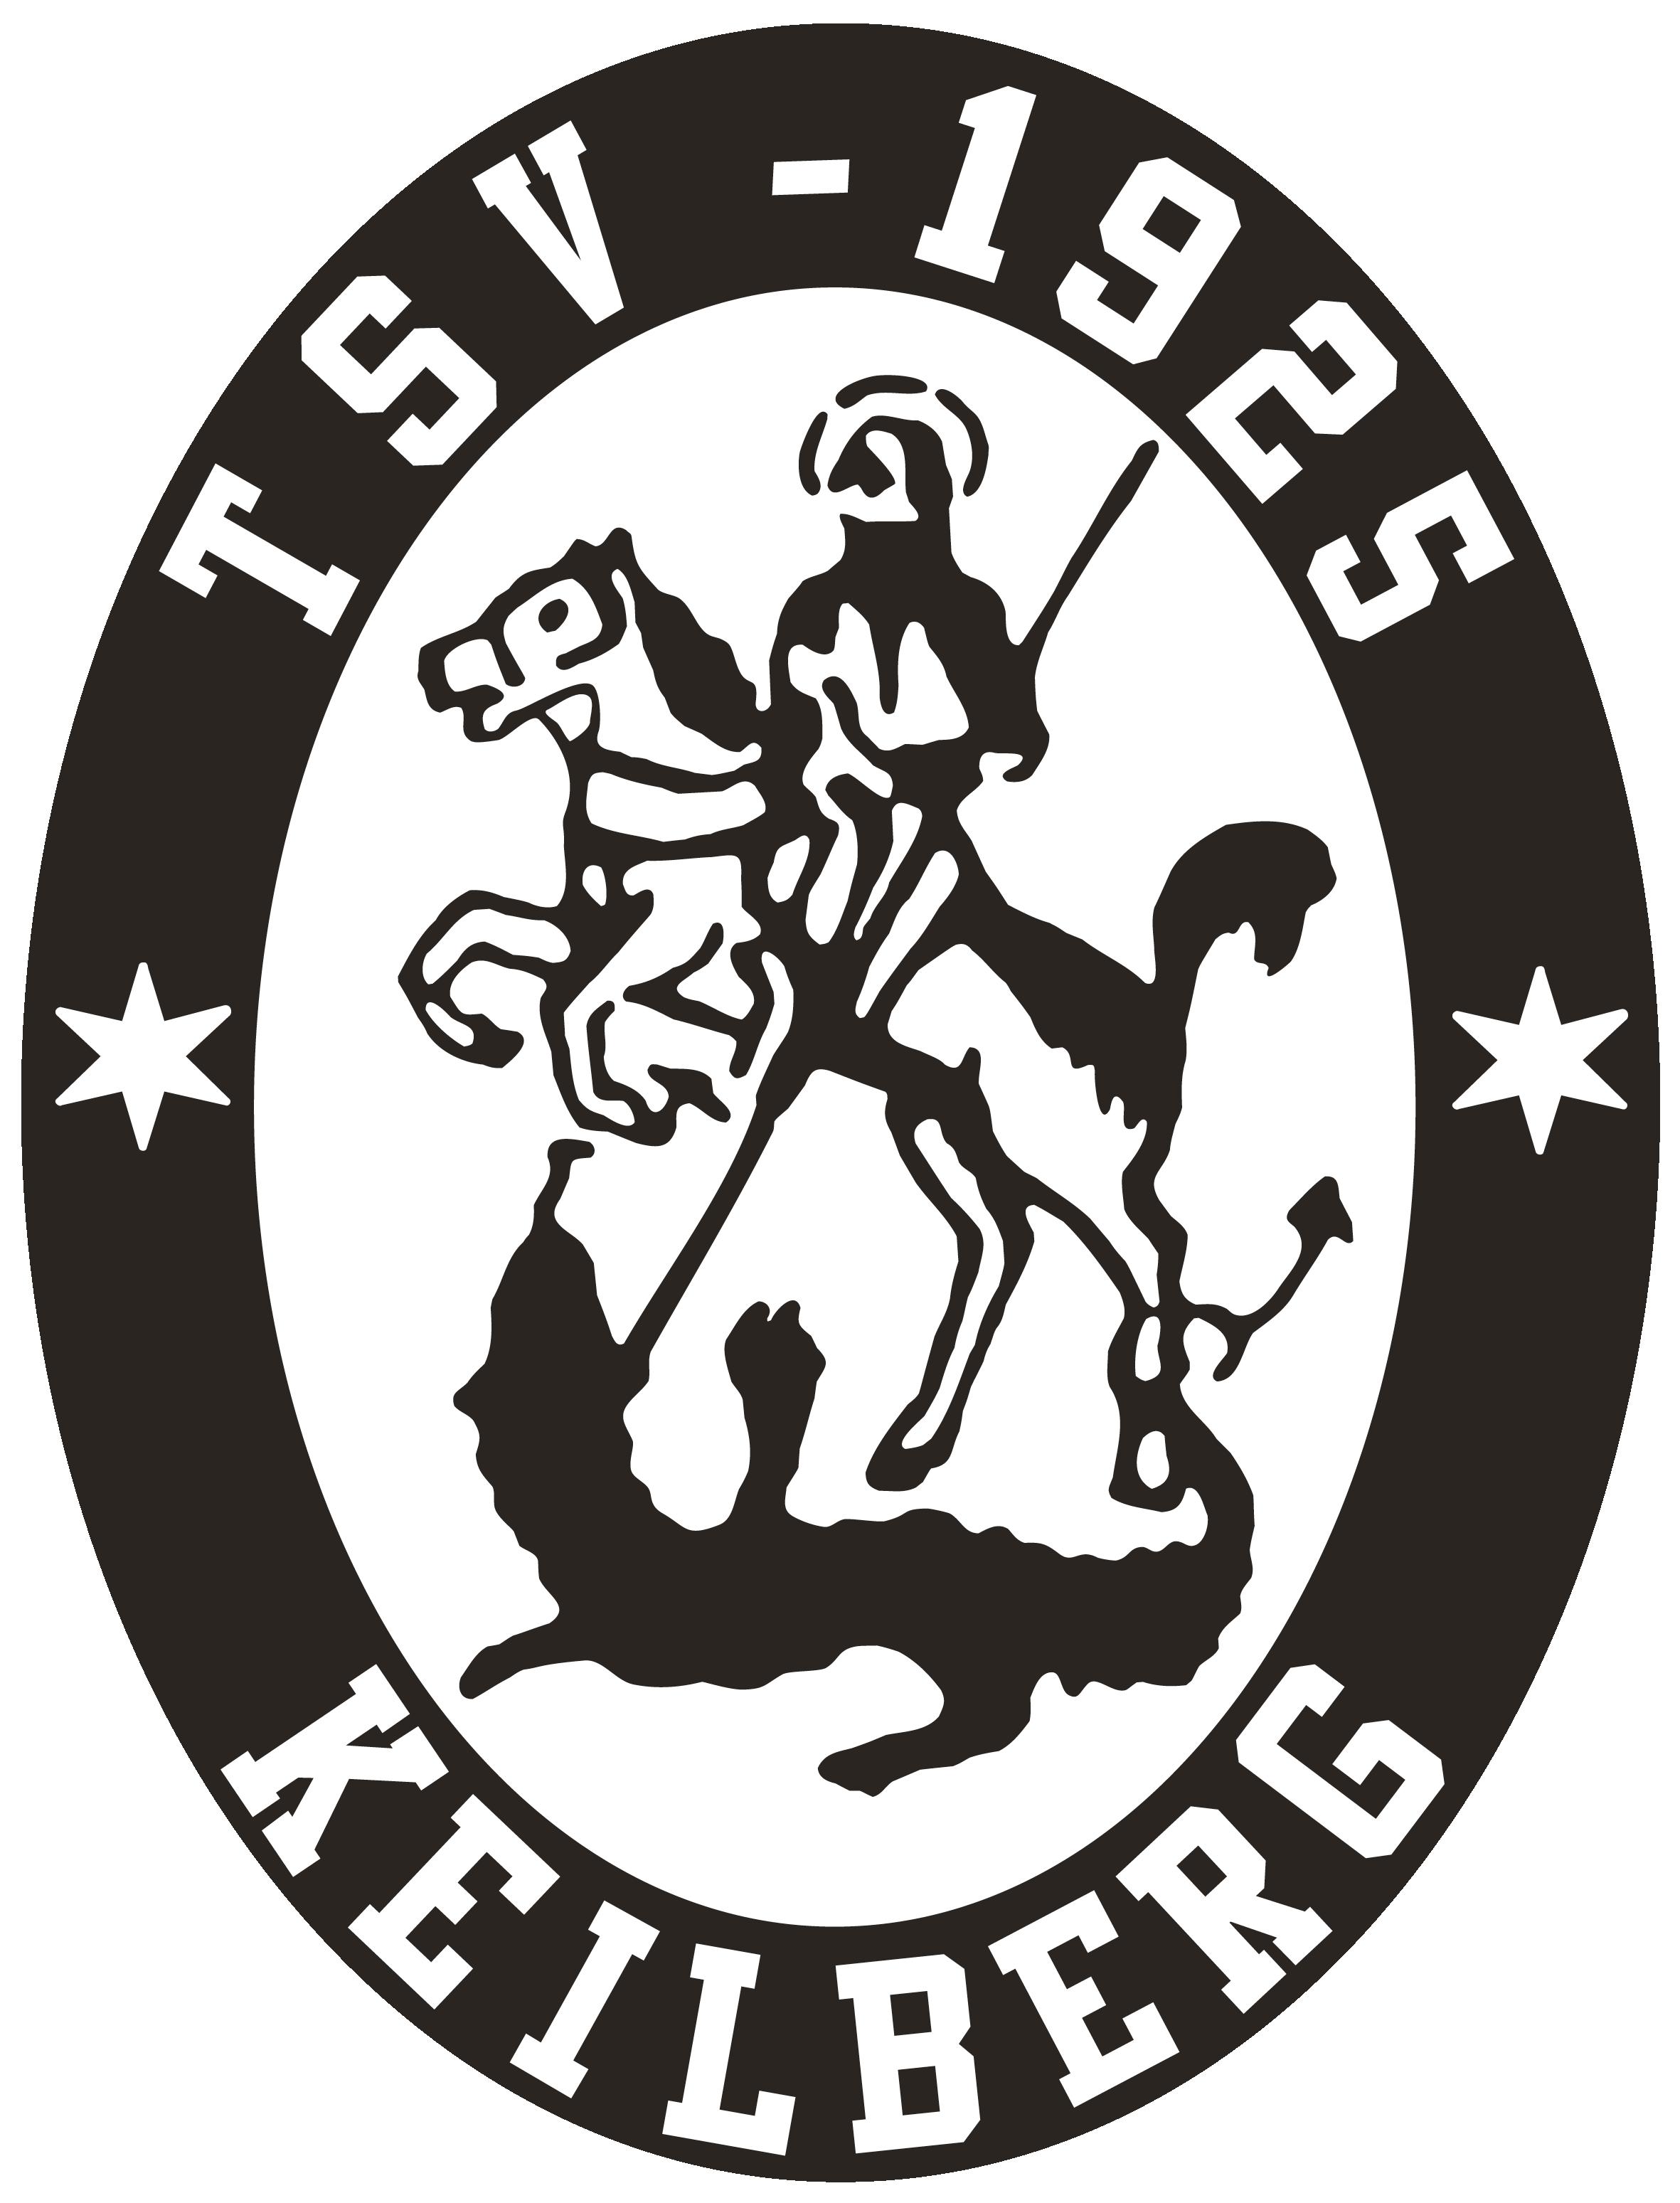 TSV 1925 Keilberg e.V.